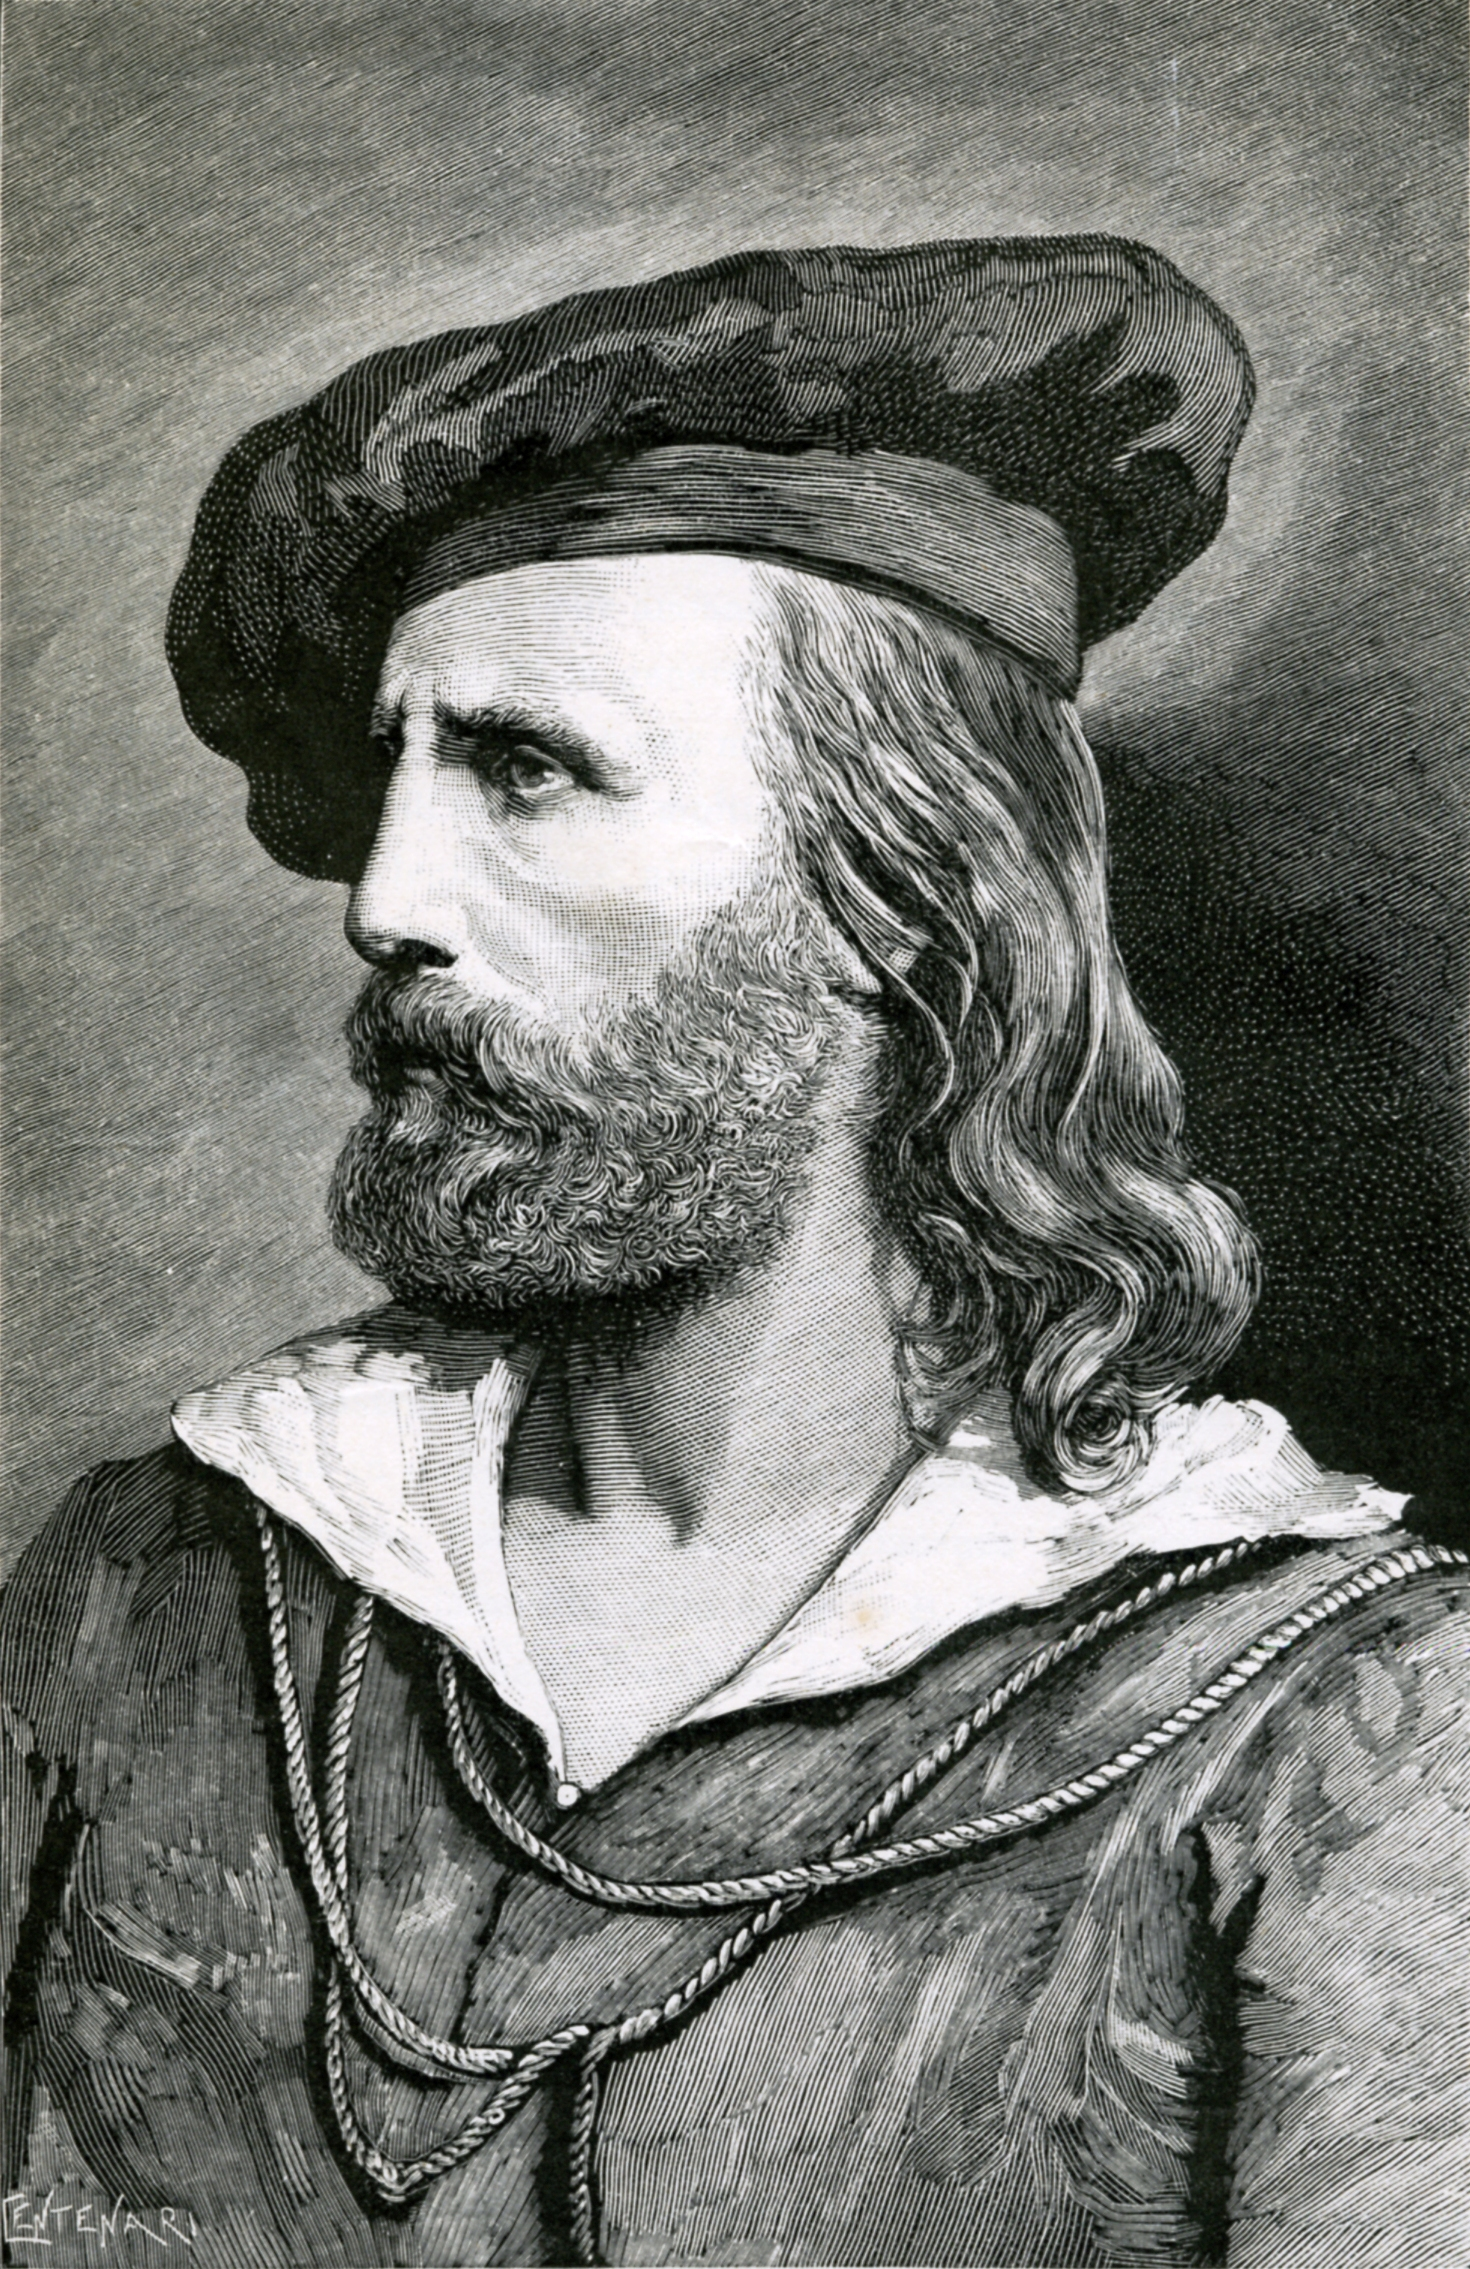 Garibaldi marinaio La voce del marinaio